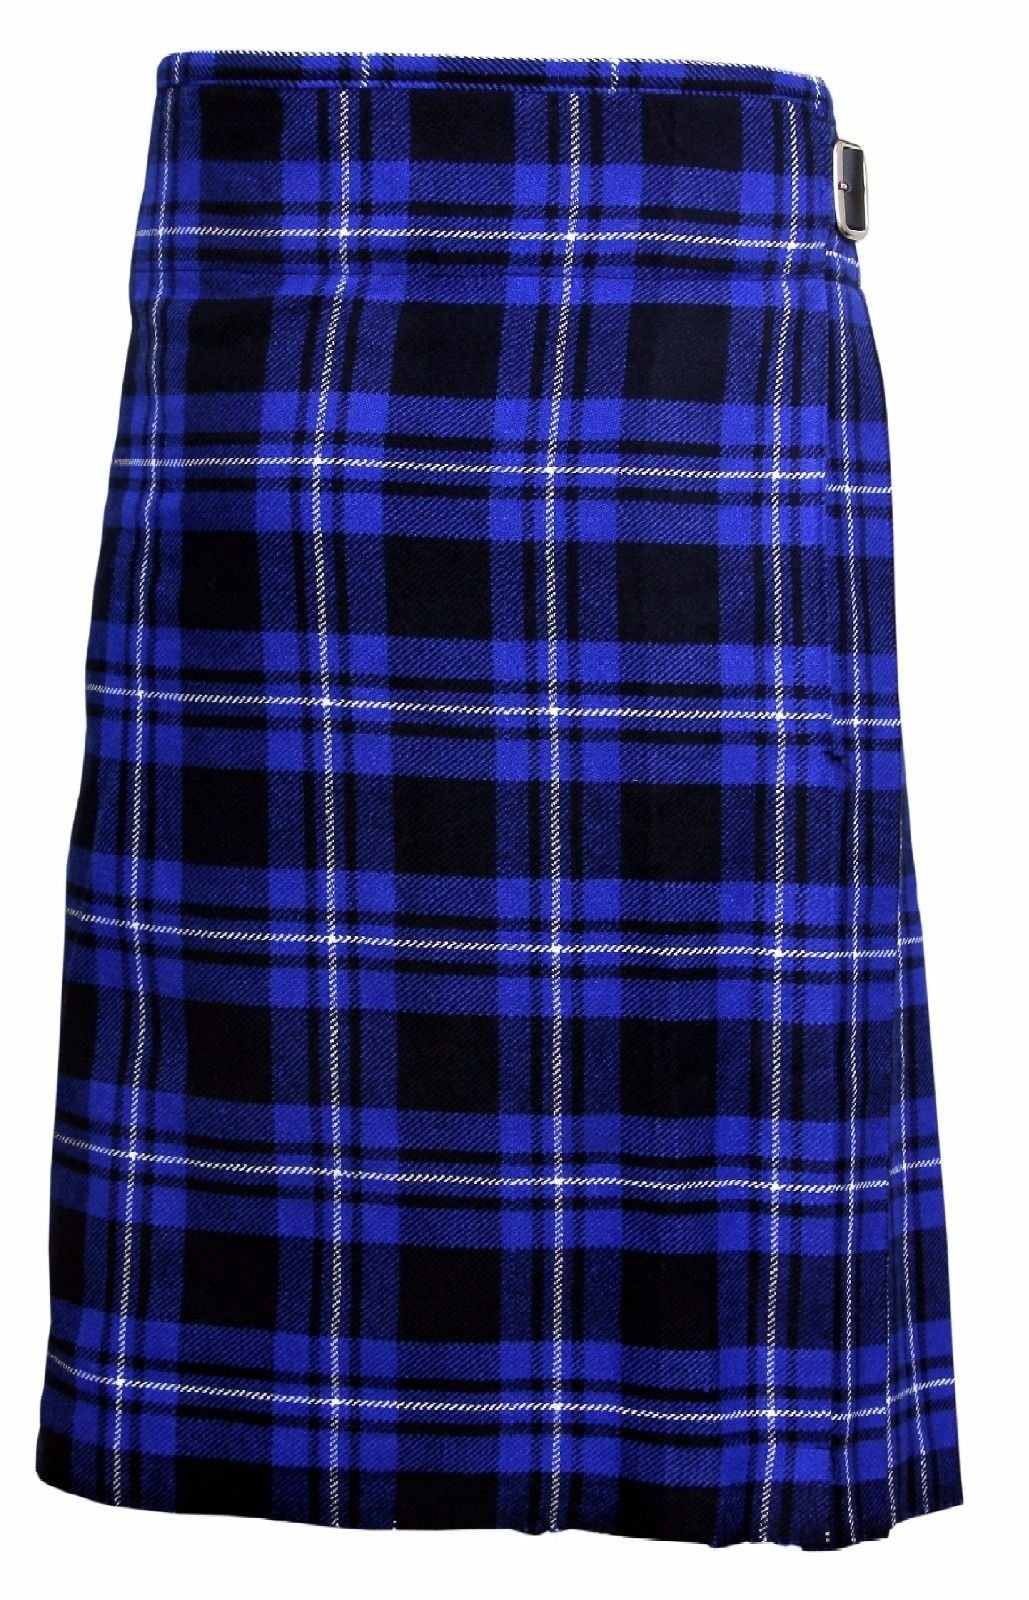 Blue Tartan Men's 5 Yard Scottish Kilts Tartan Kilt 13oz Highland Casual Kilt (40'')